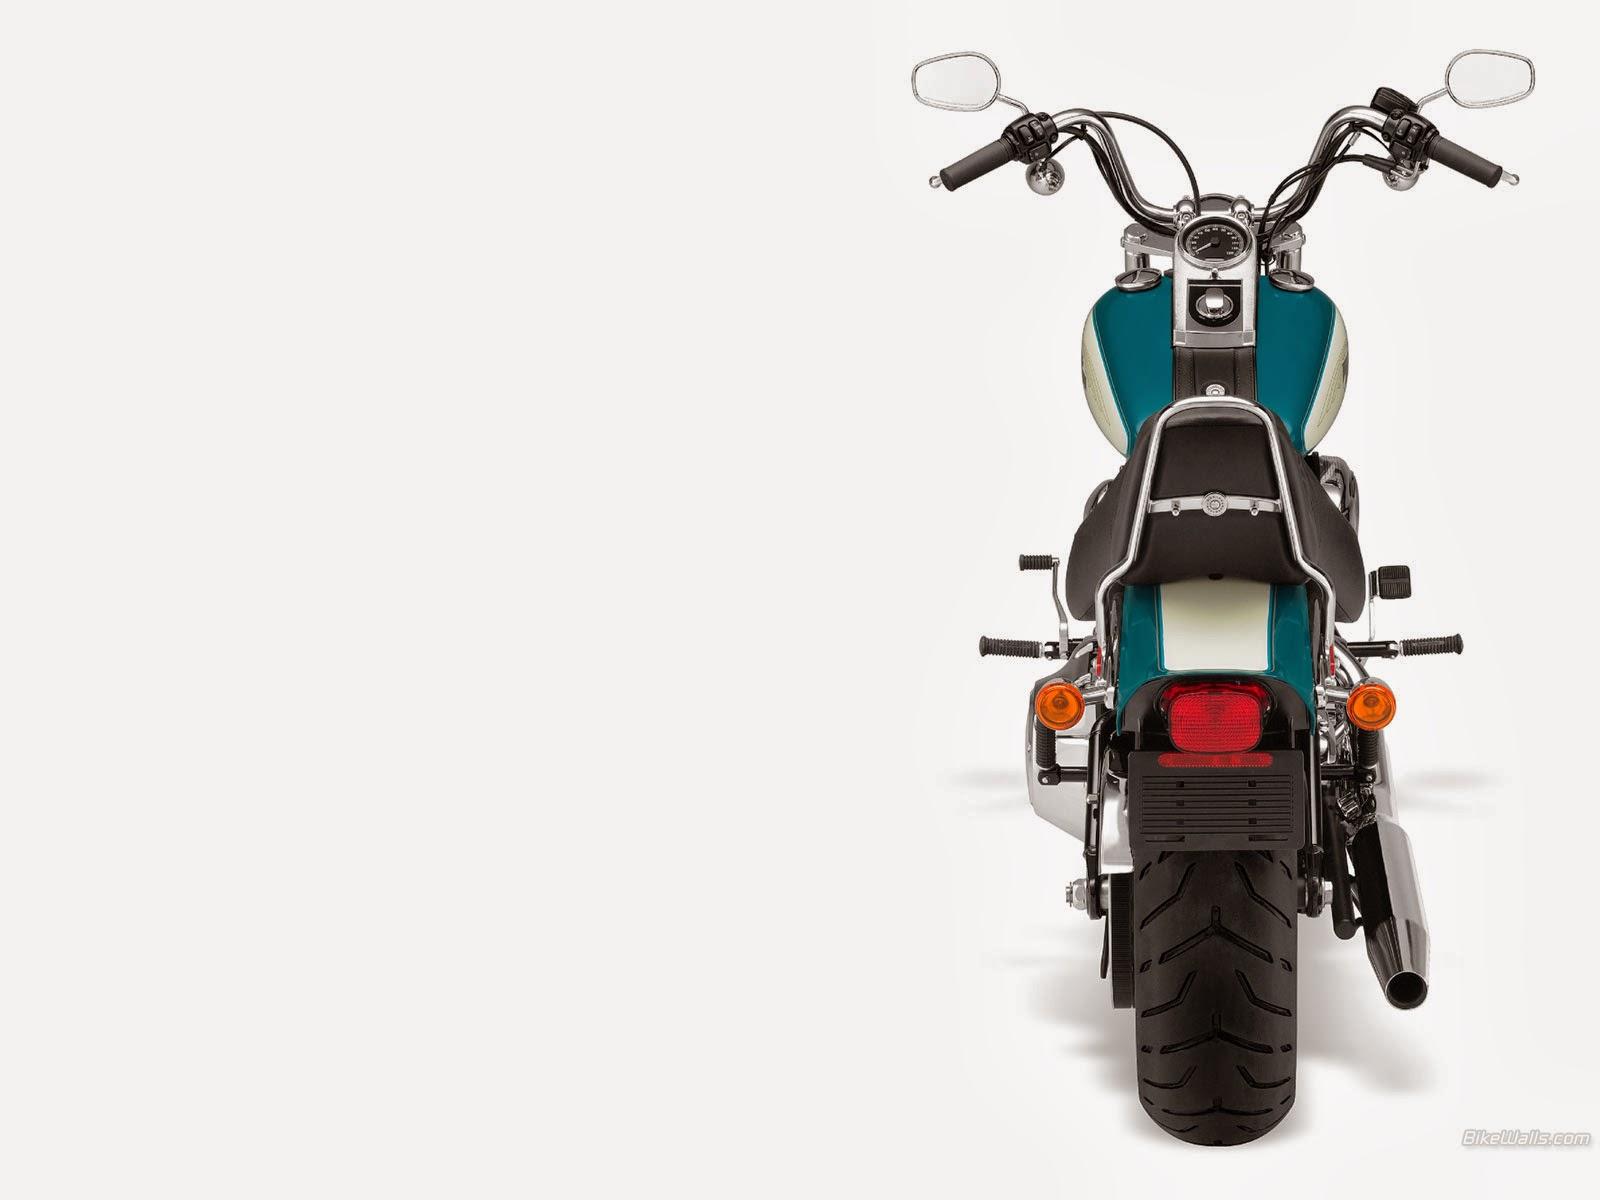 Harley Davidson FXSTC Softail-2